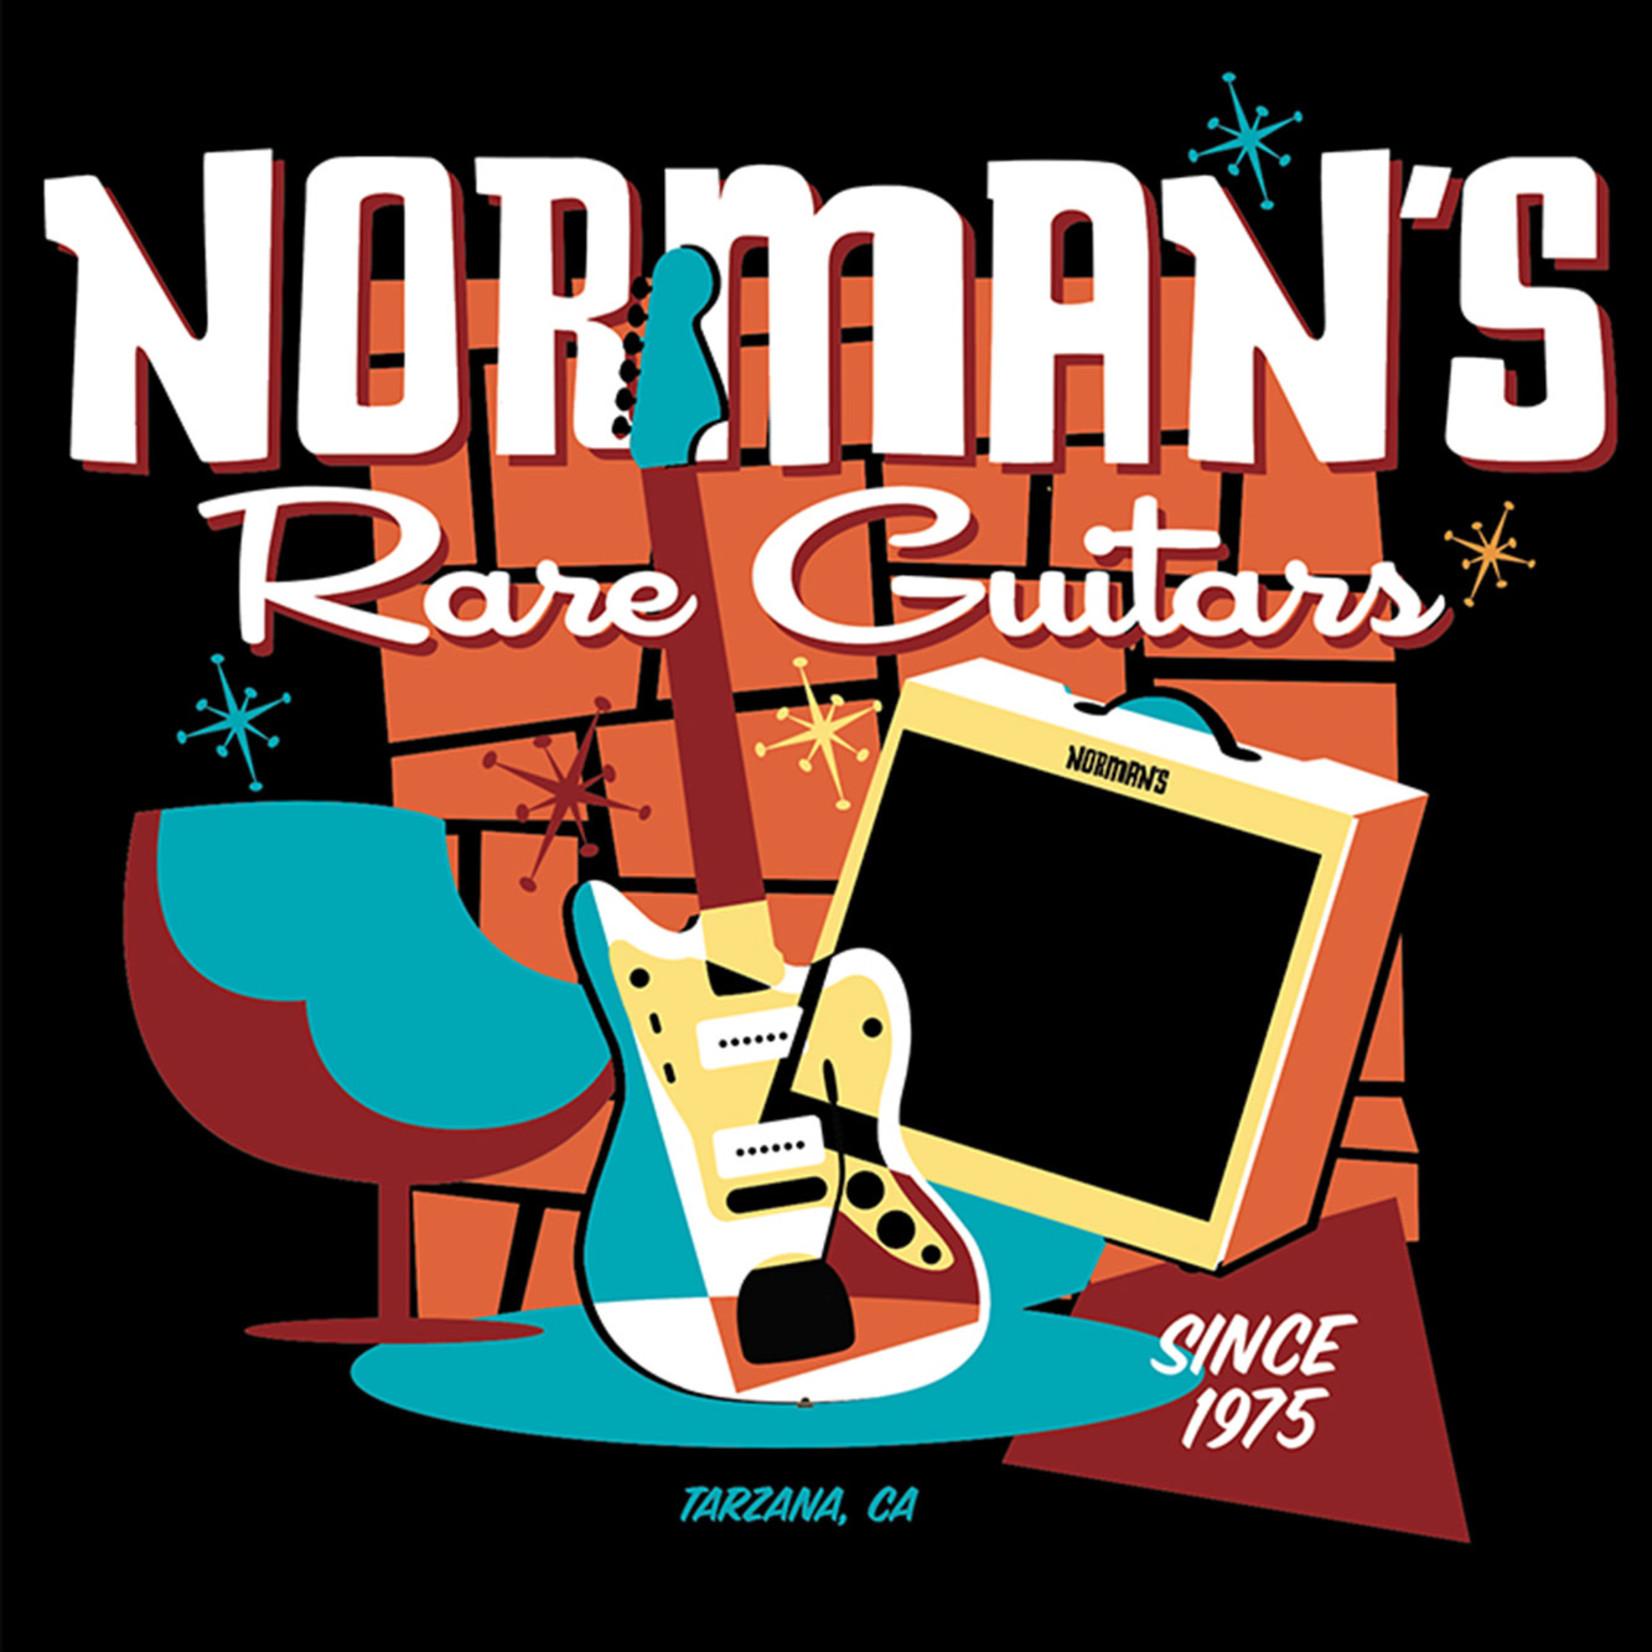 Norman's Rare Guitars Vintage Jazzmaster T-Shirt